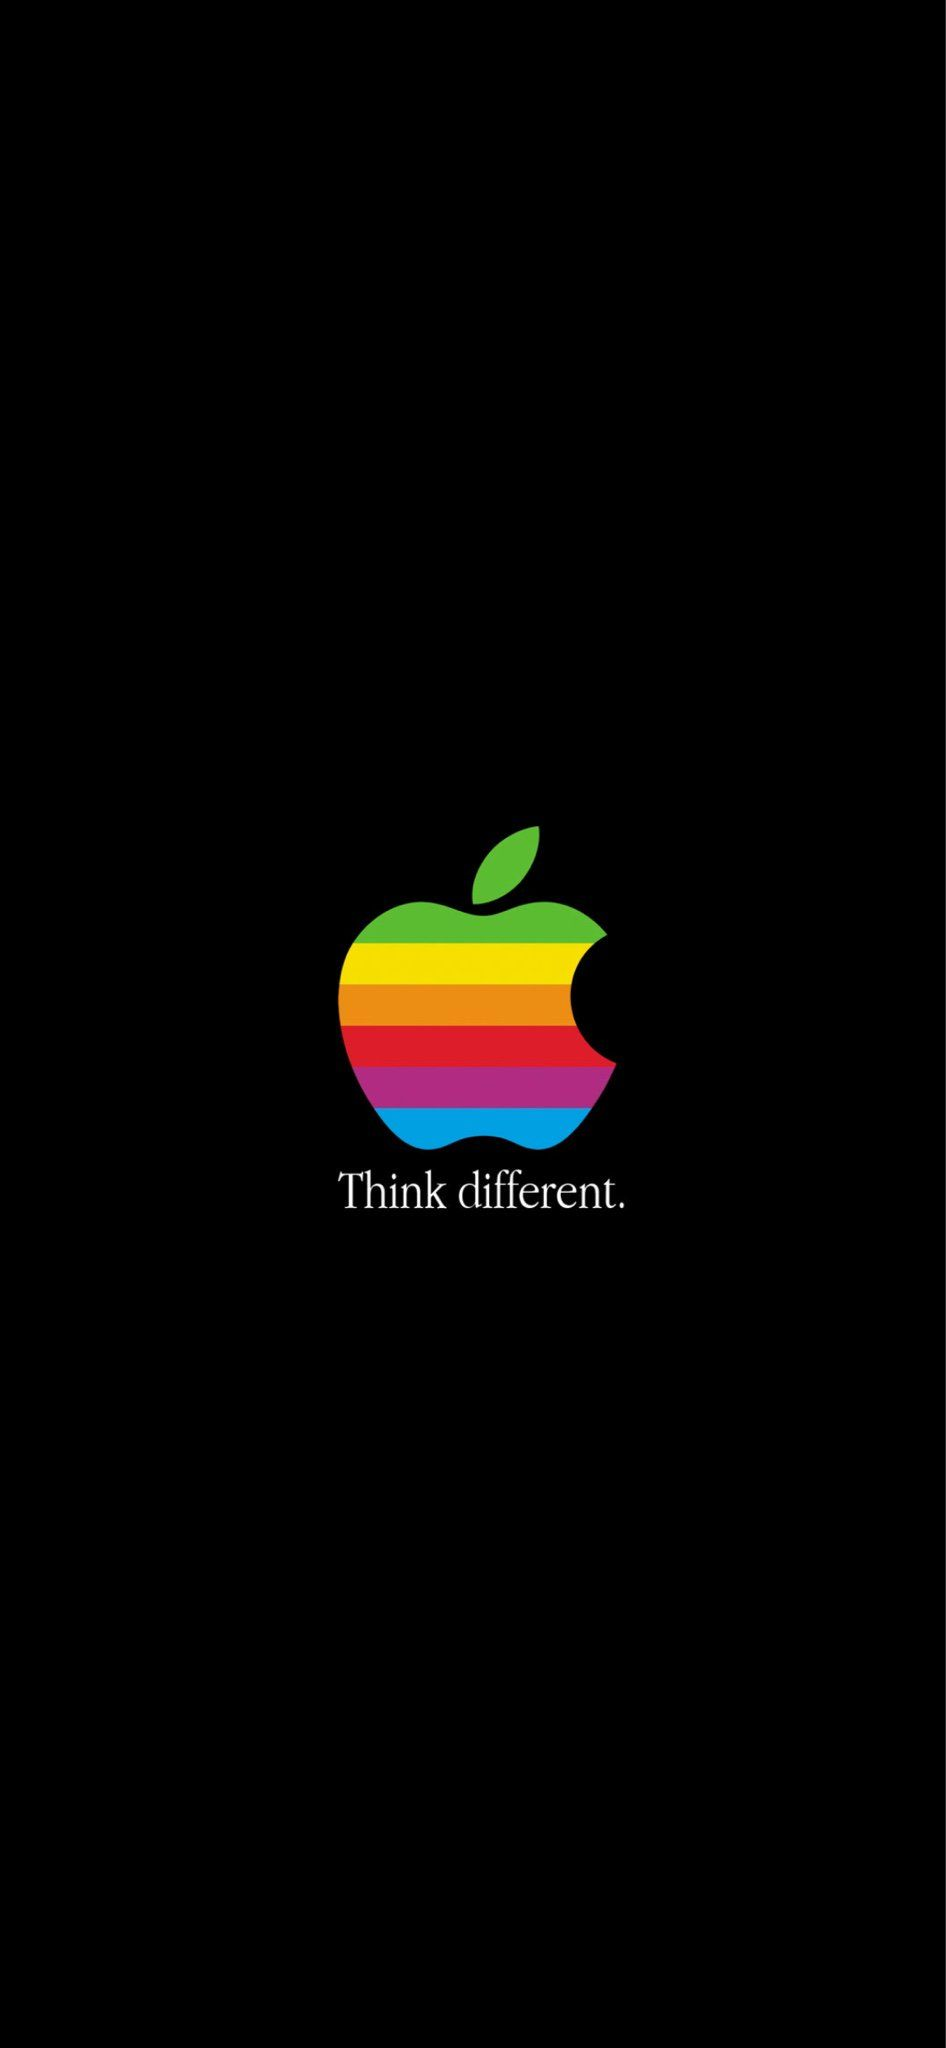 Classic Logo Apple Iphone 壁紙 アップルロゴ 壁紙